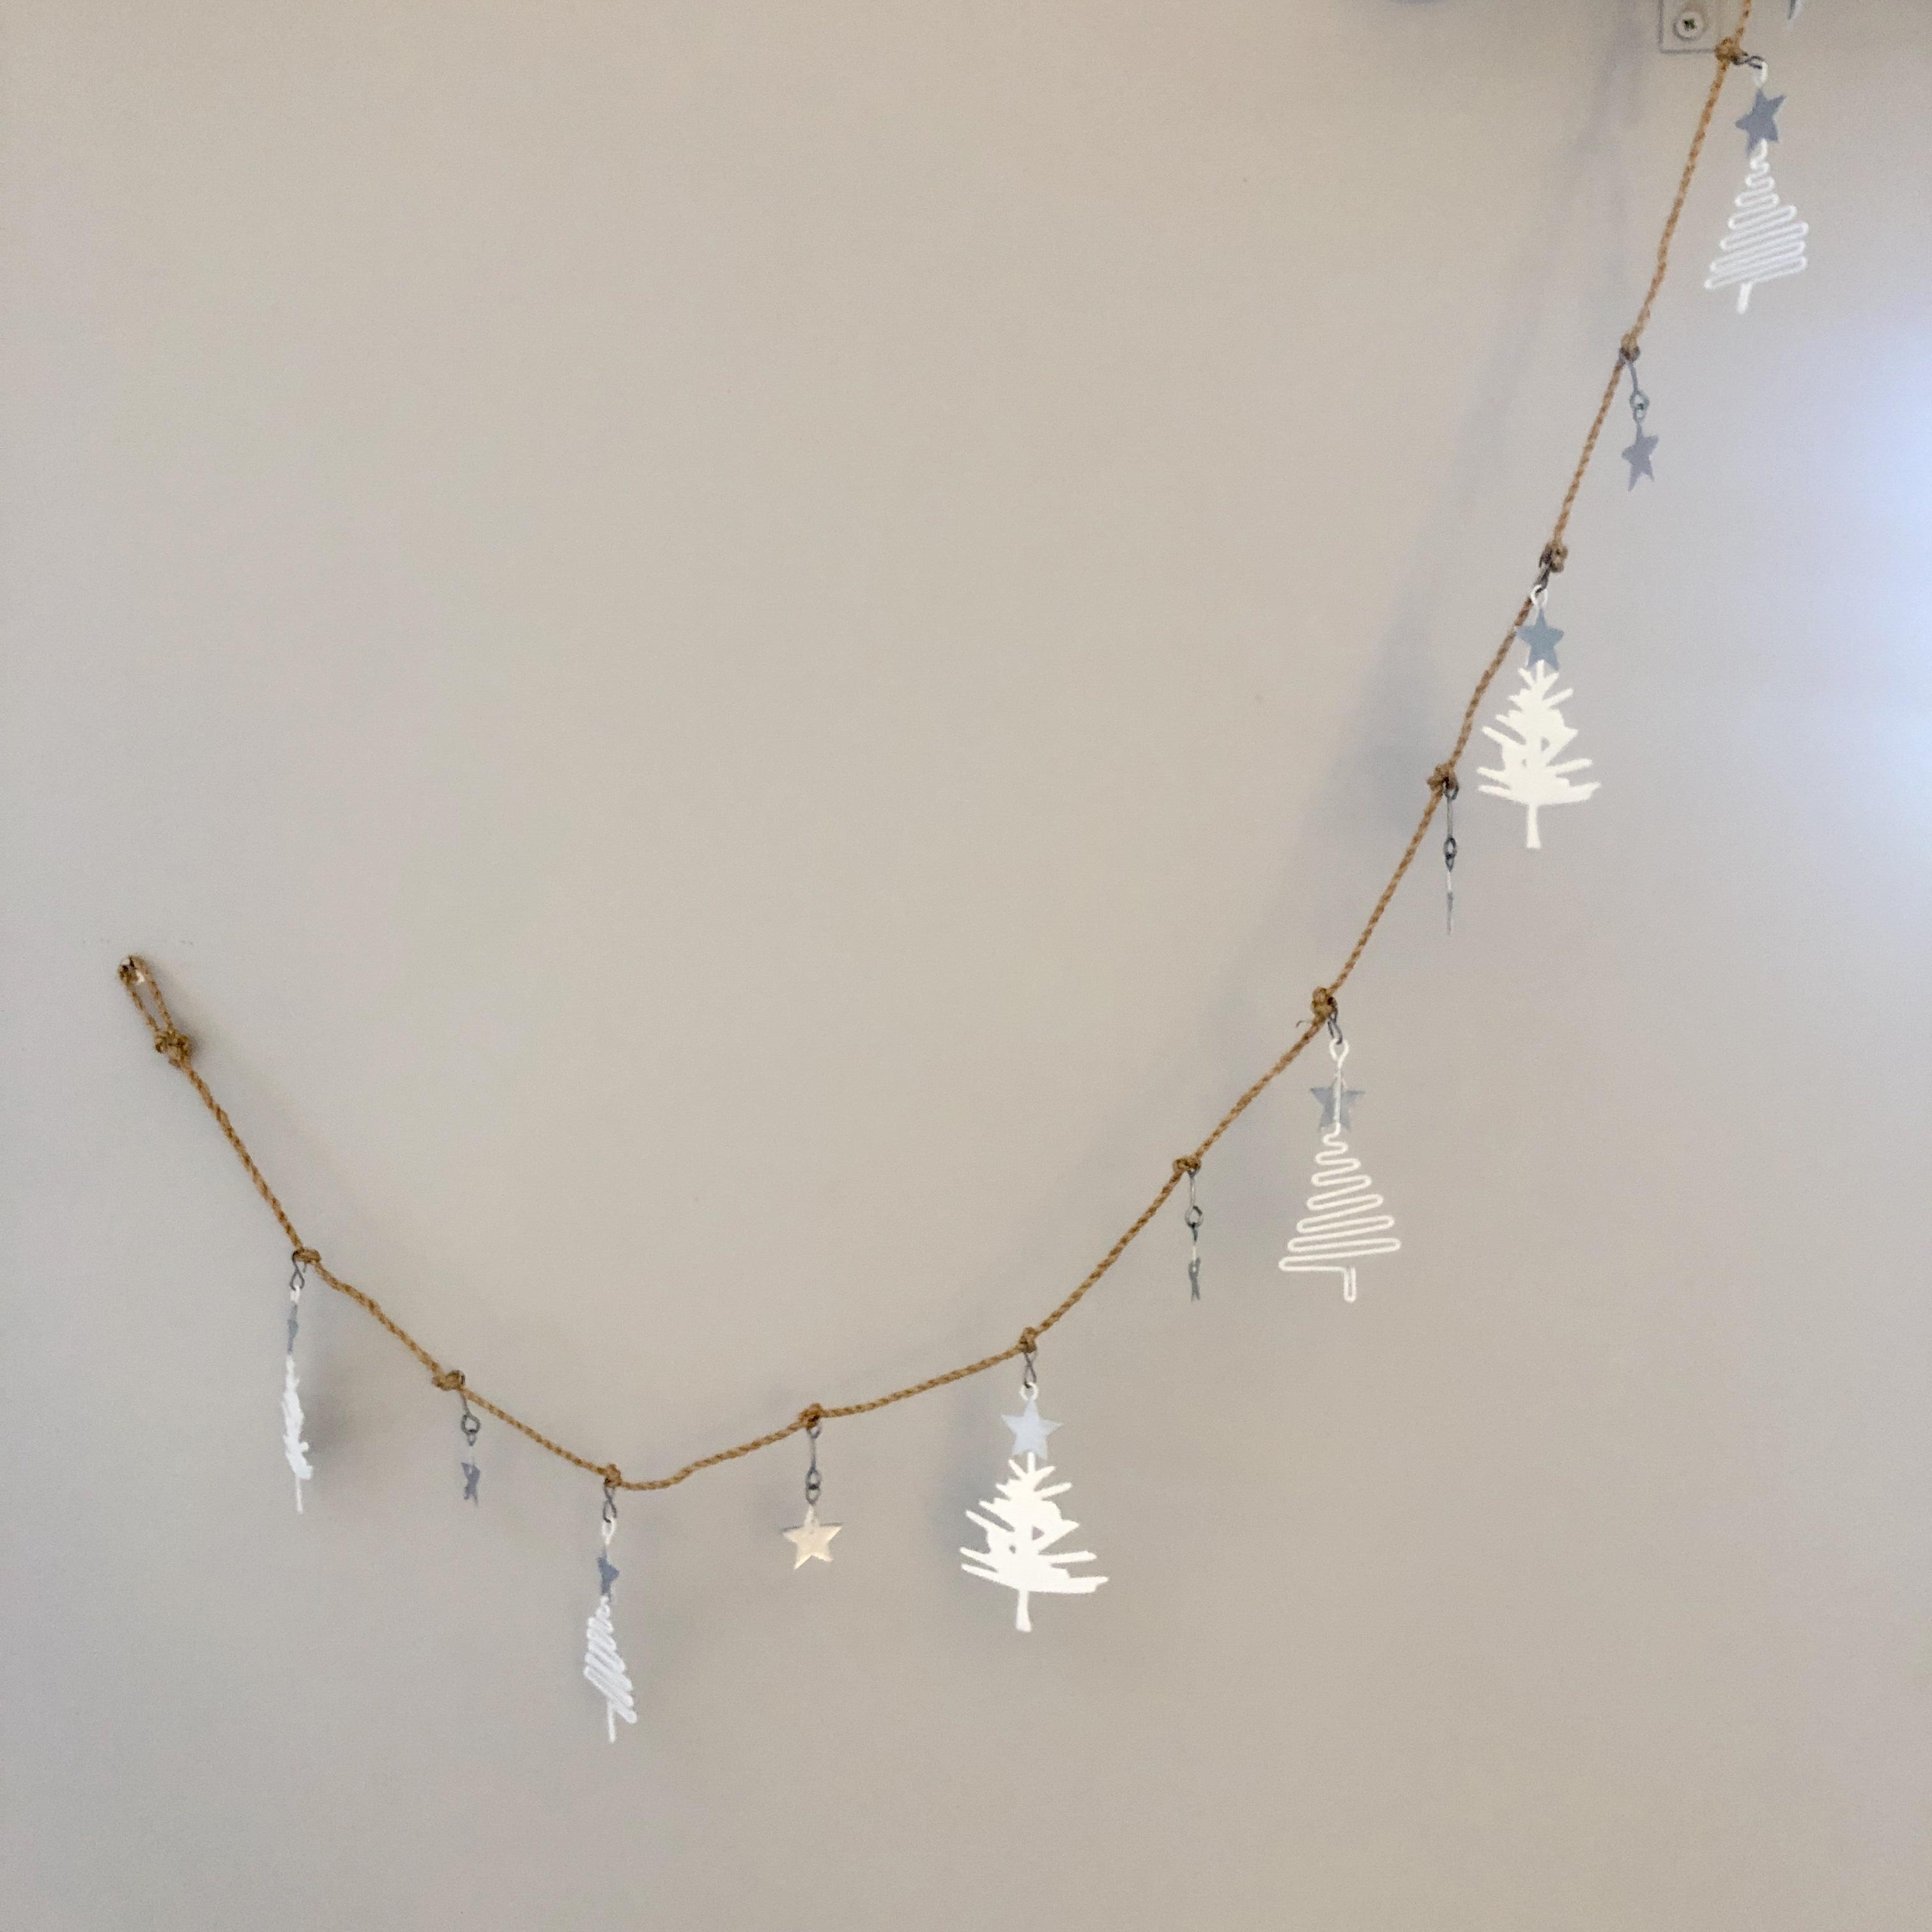 White tree Christmas garland by shoeless joe